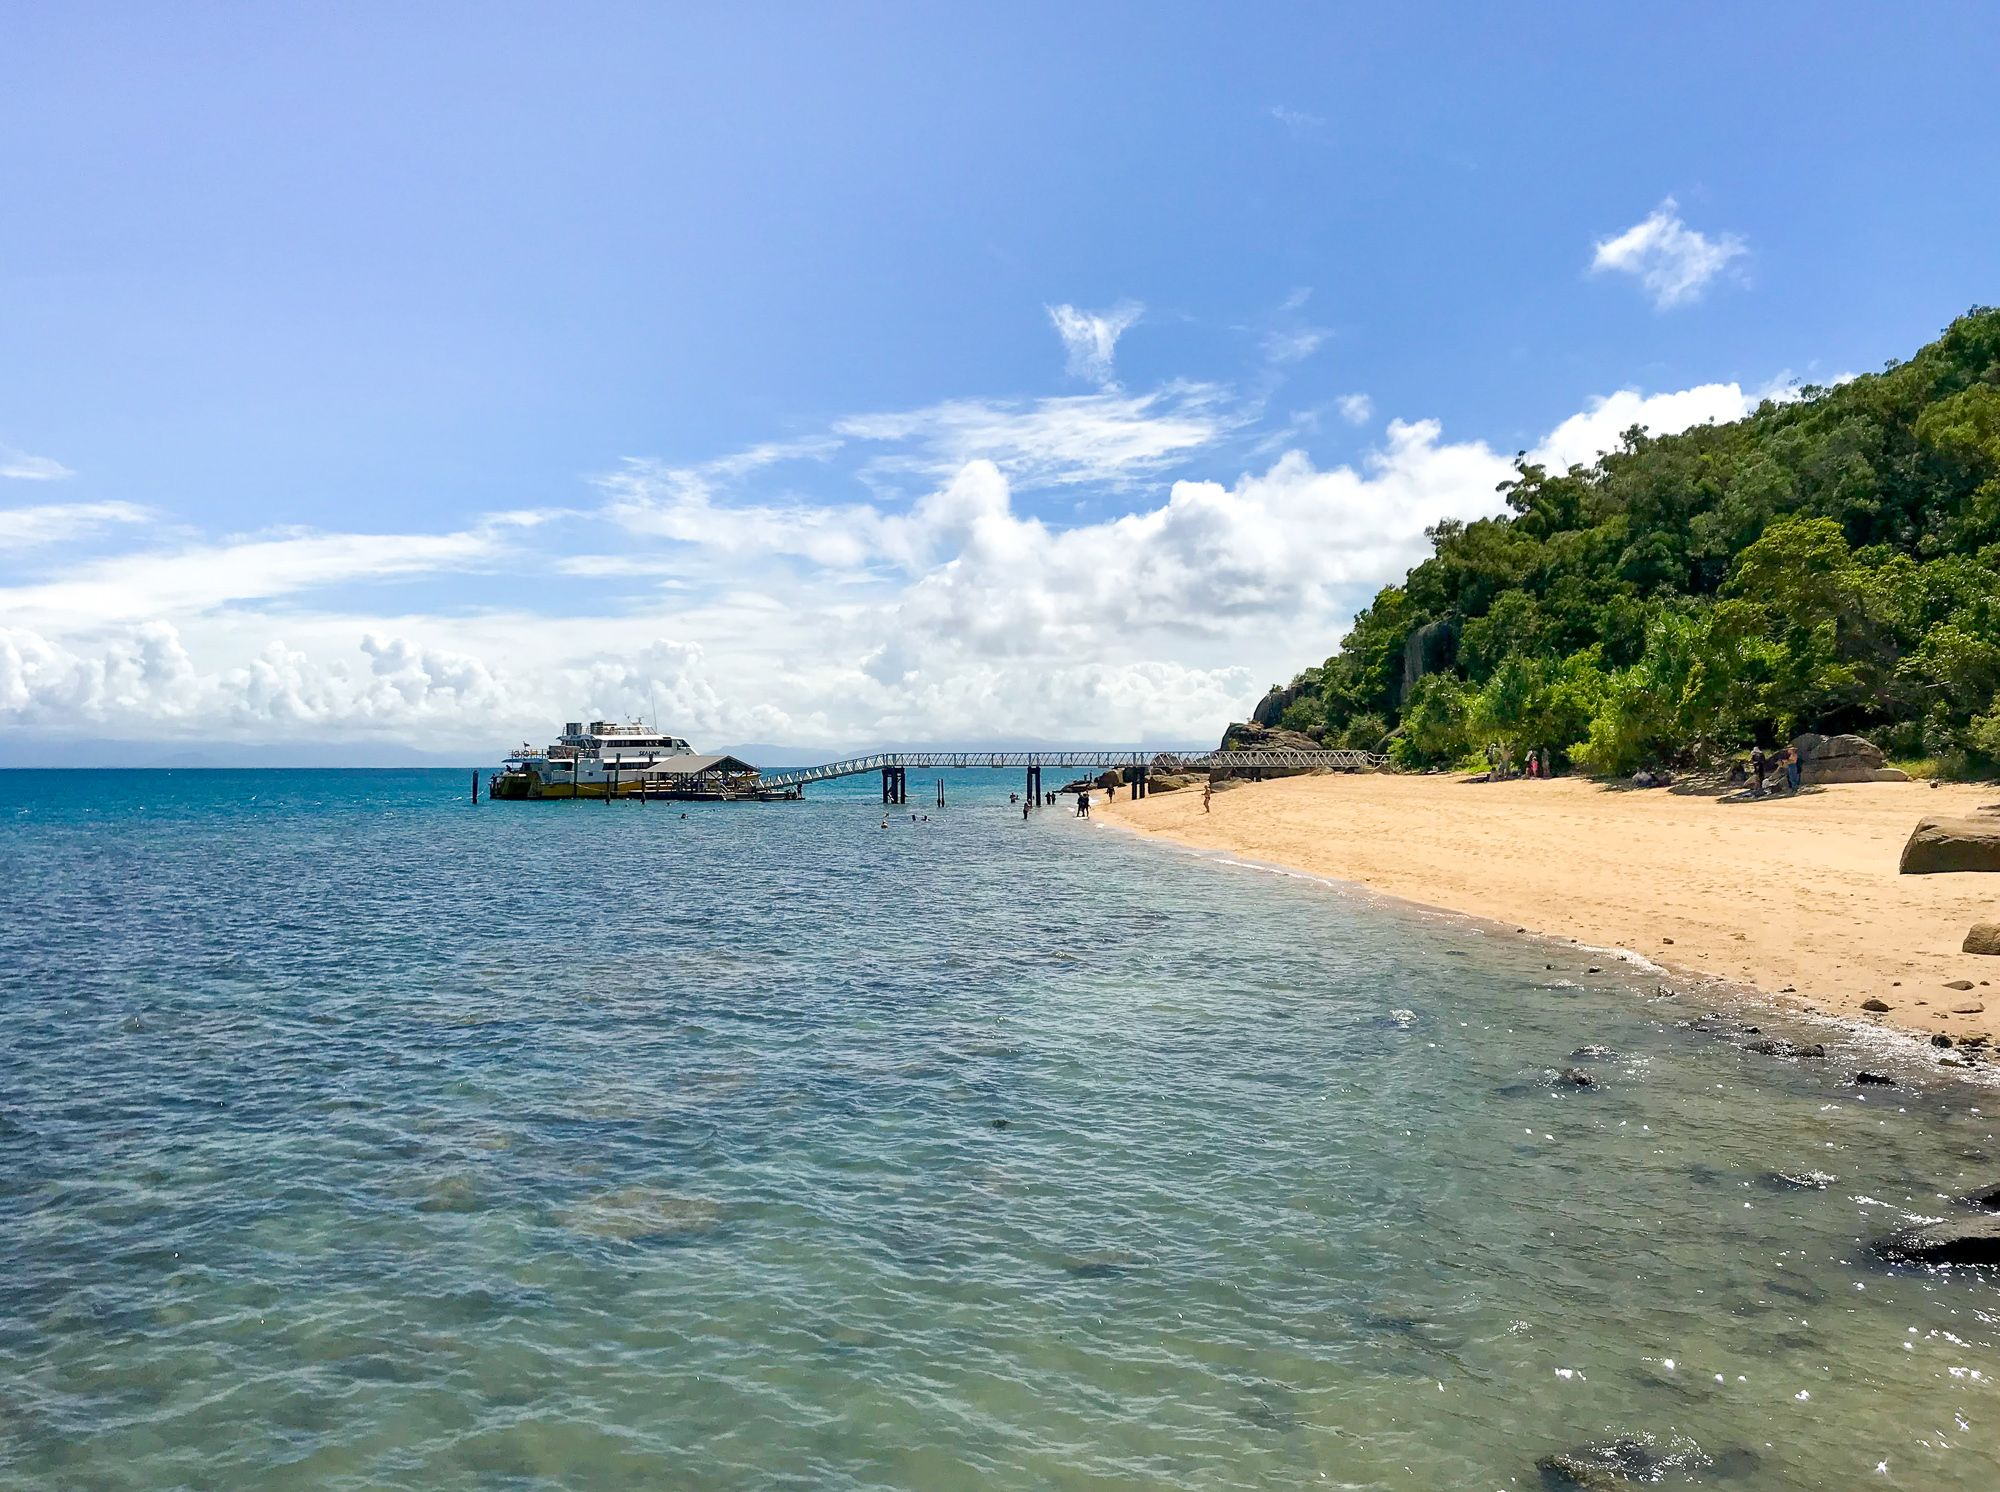 Yank's Jetty, Orpheus Island